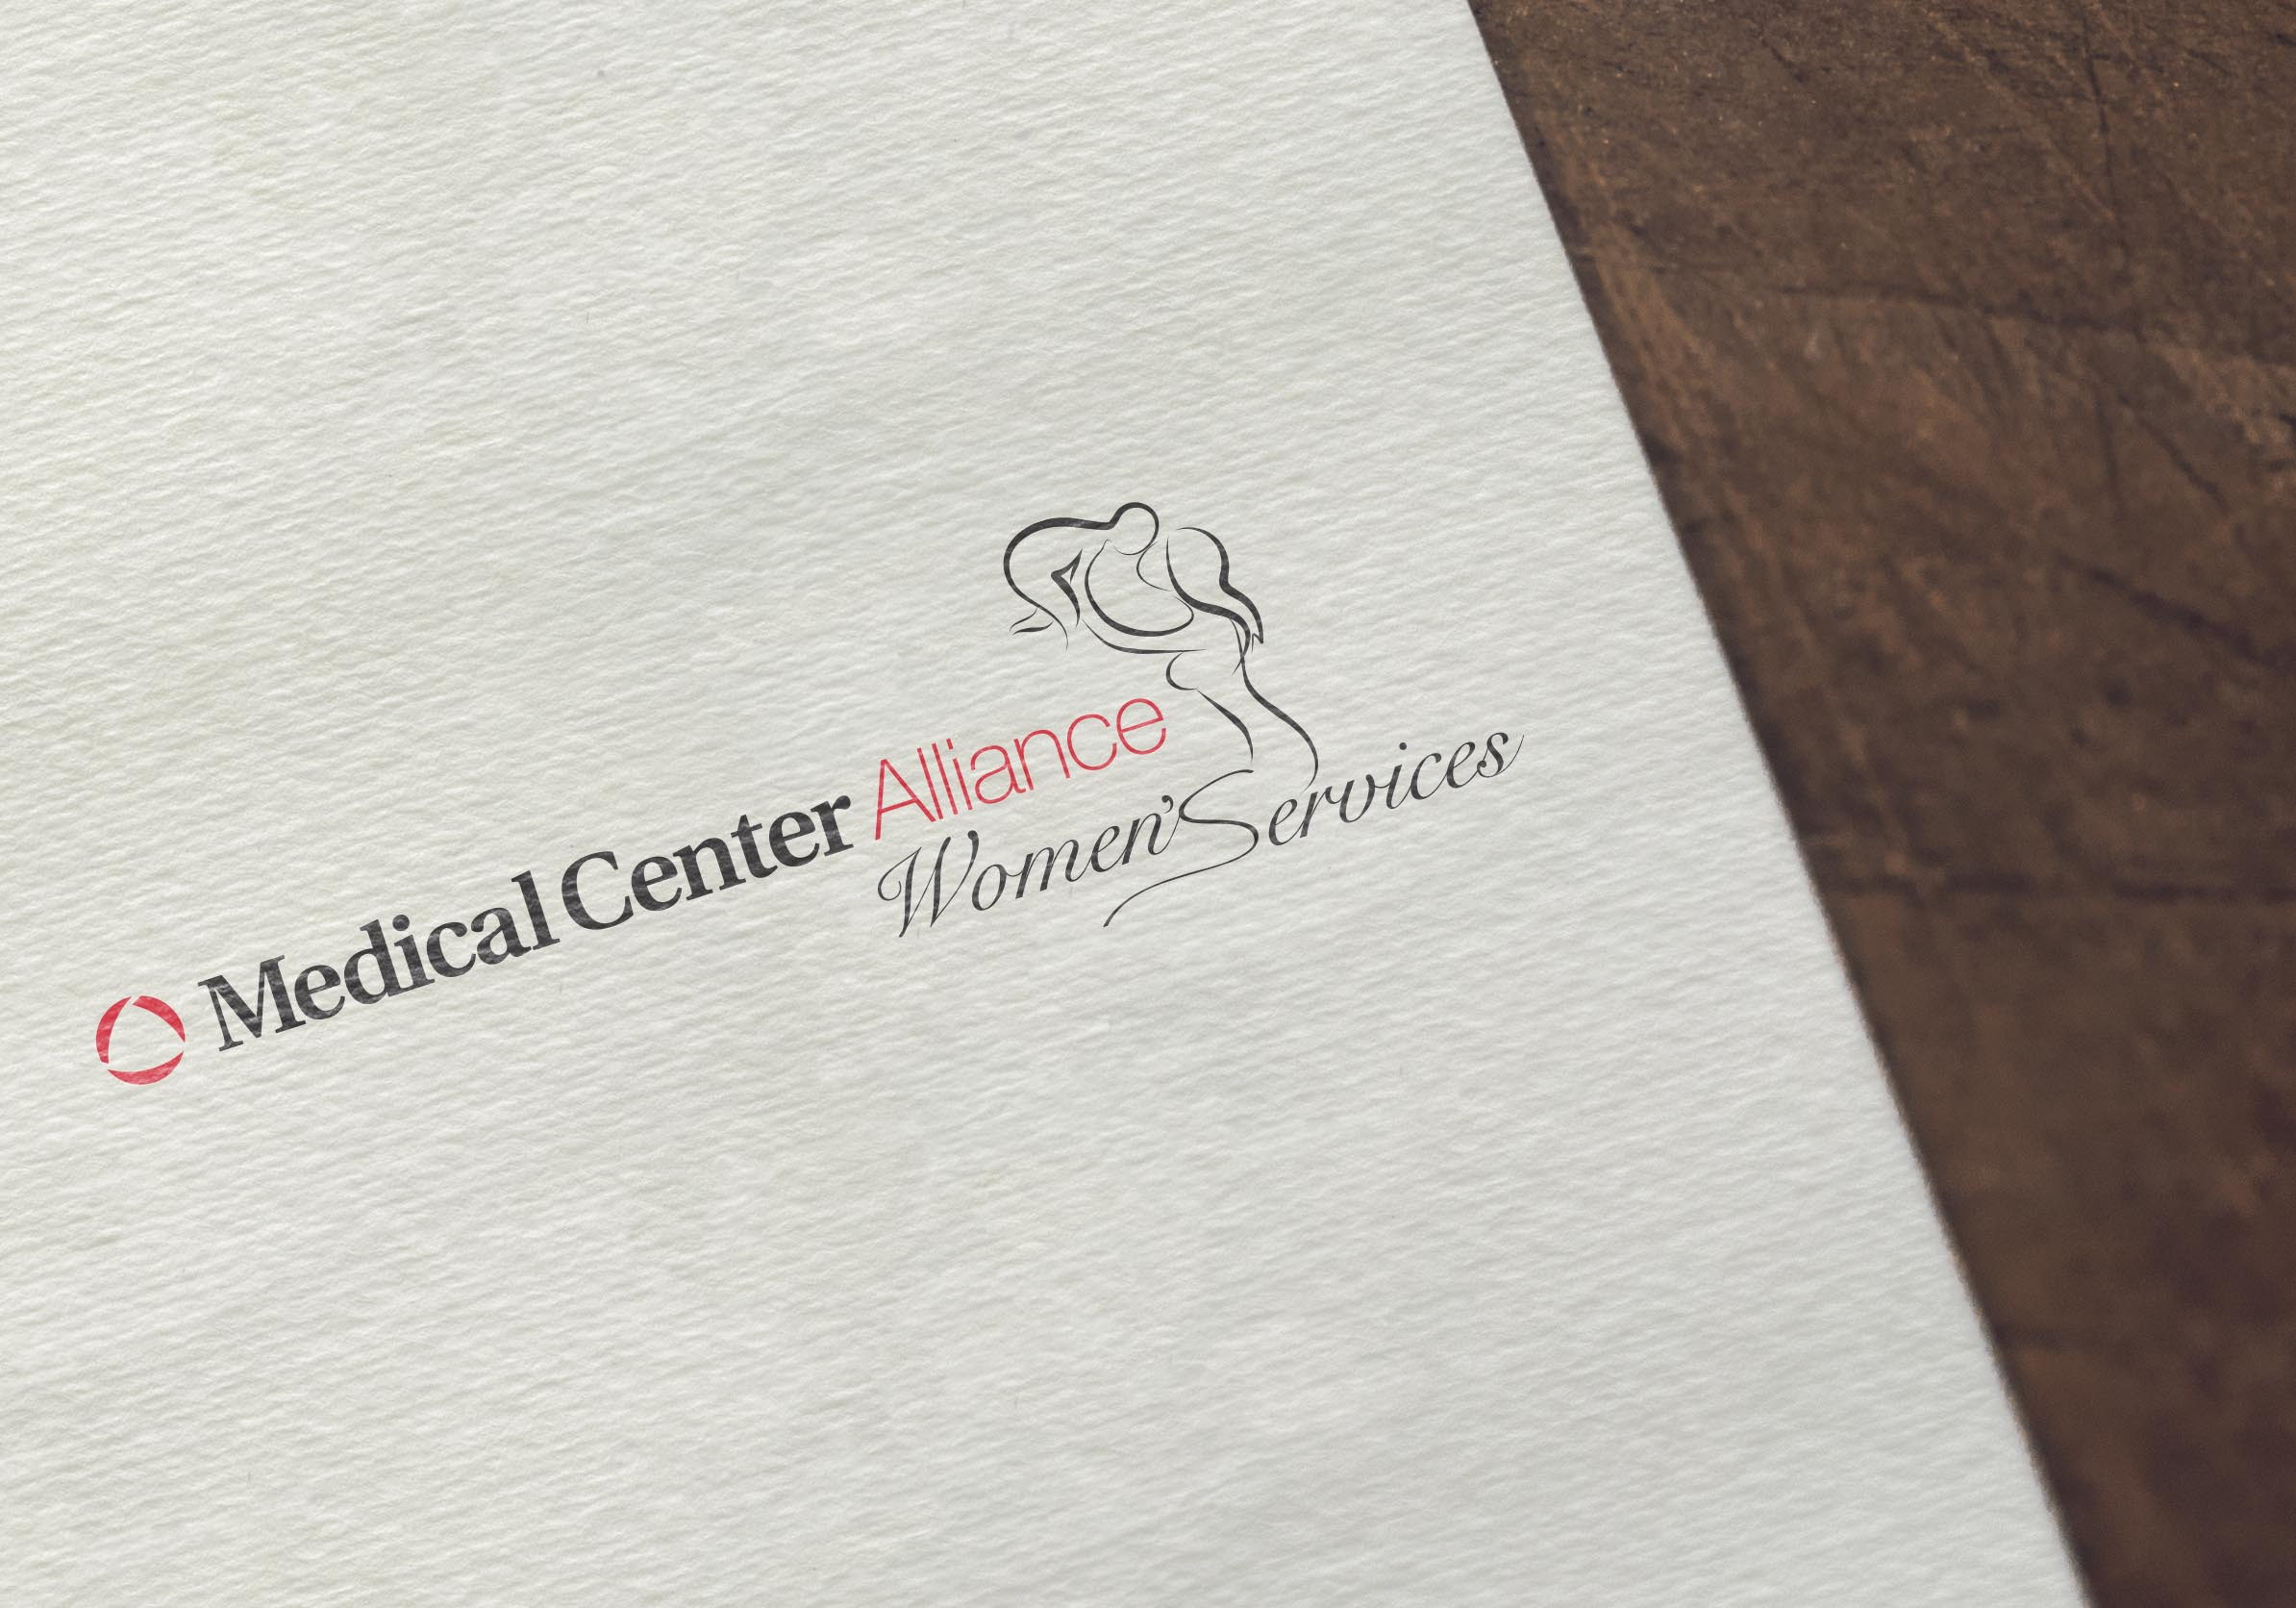 Medical Center Allliance Women's Services